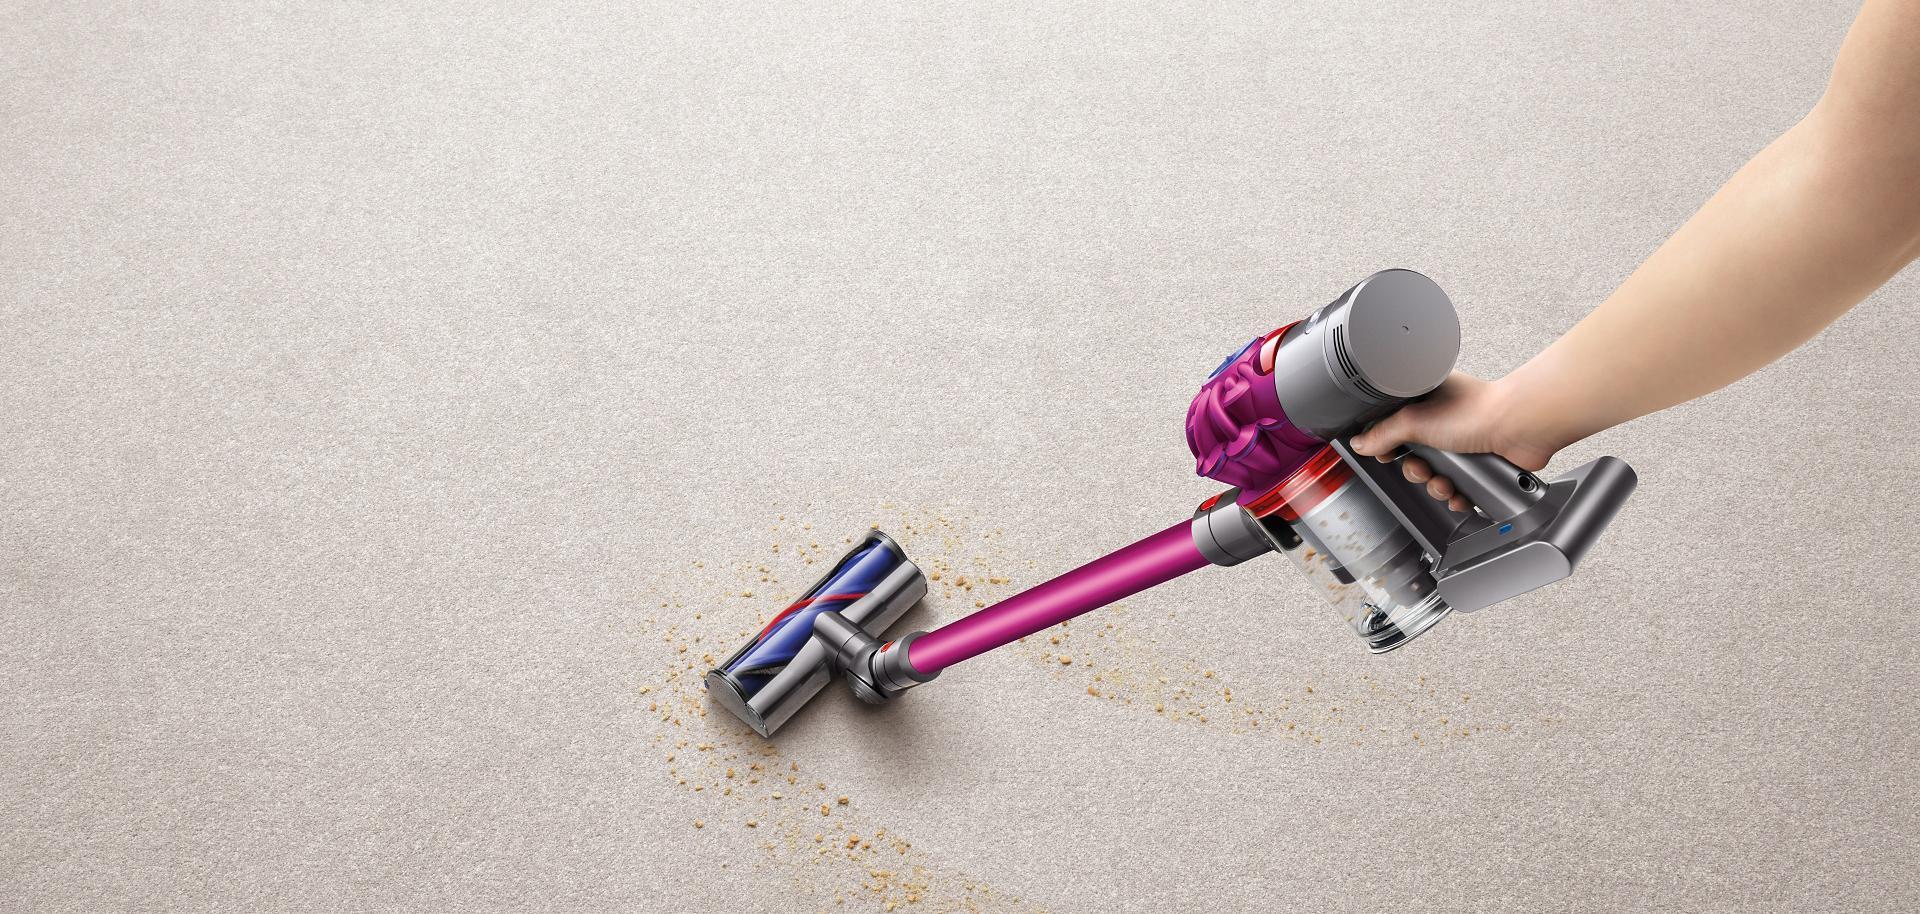 Dyson cord-free vacuum on carpet